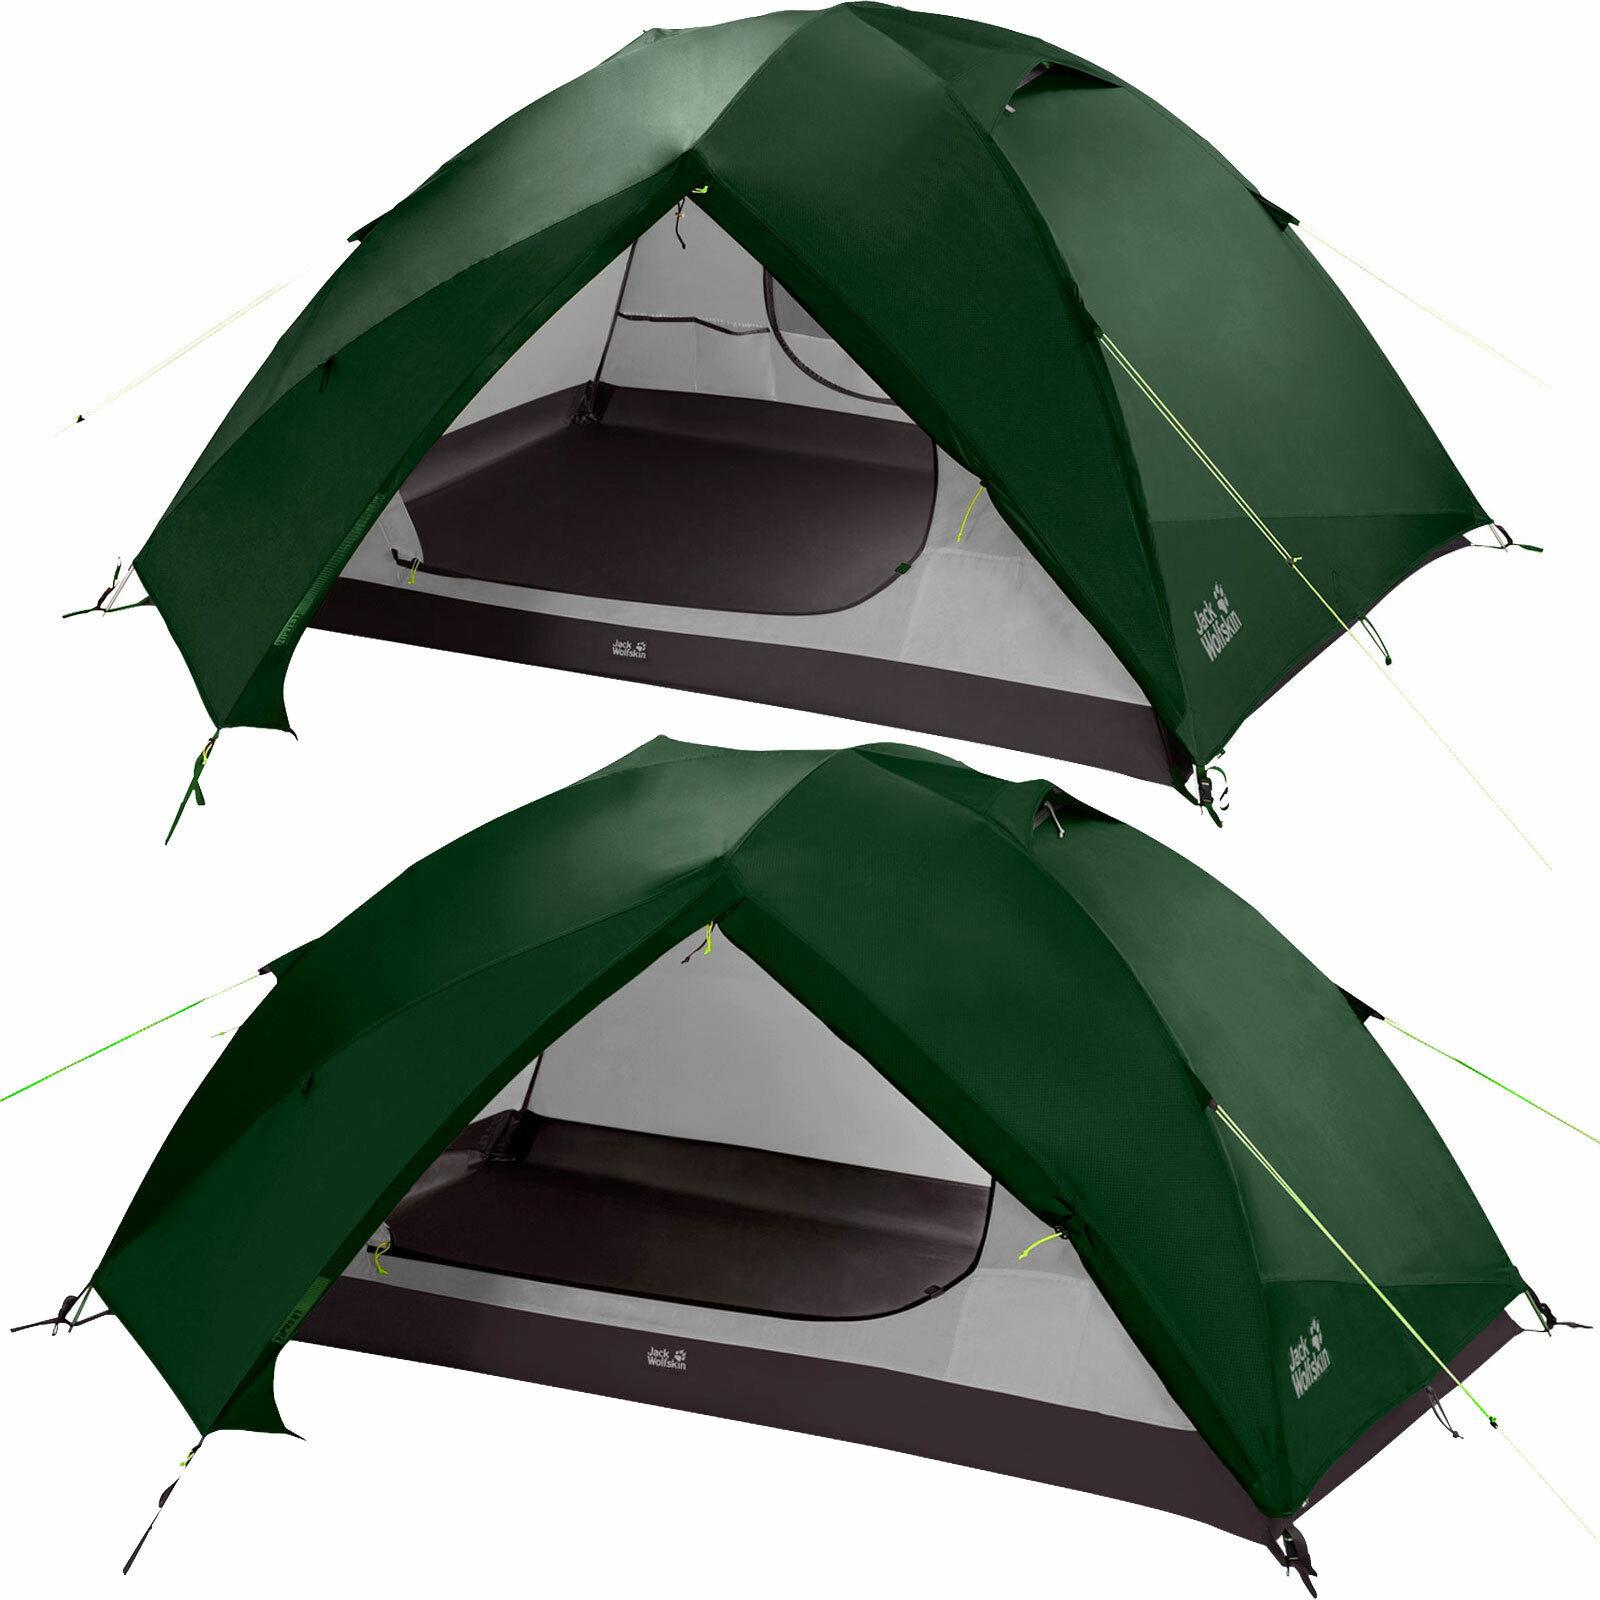 Jack Wolfskin Skyrocket Dome Dome Tent Hiking Tent Hiking Tent Tent Camping New